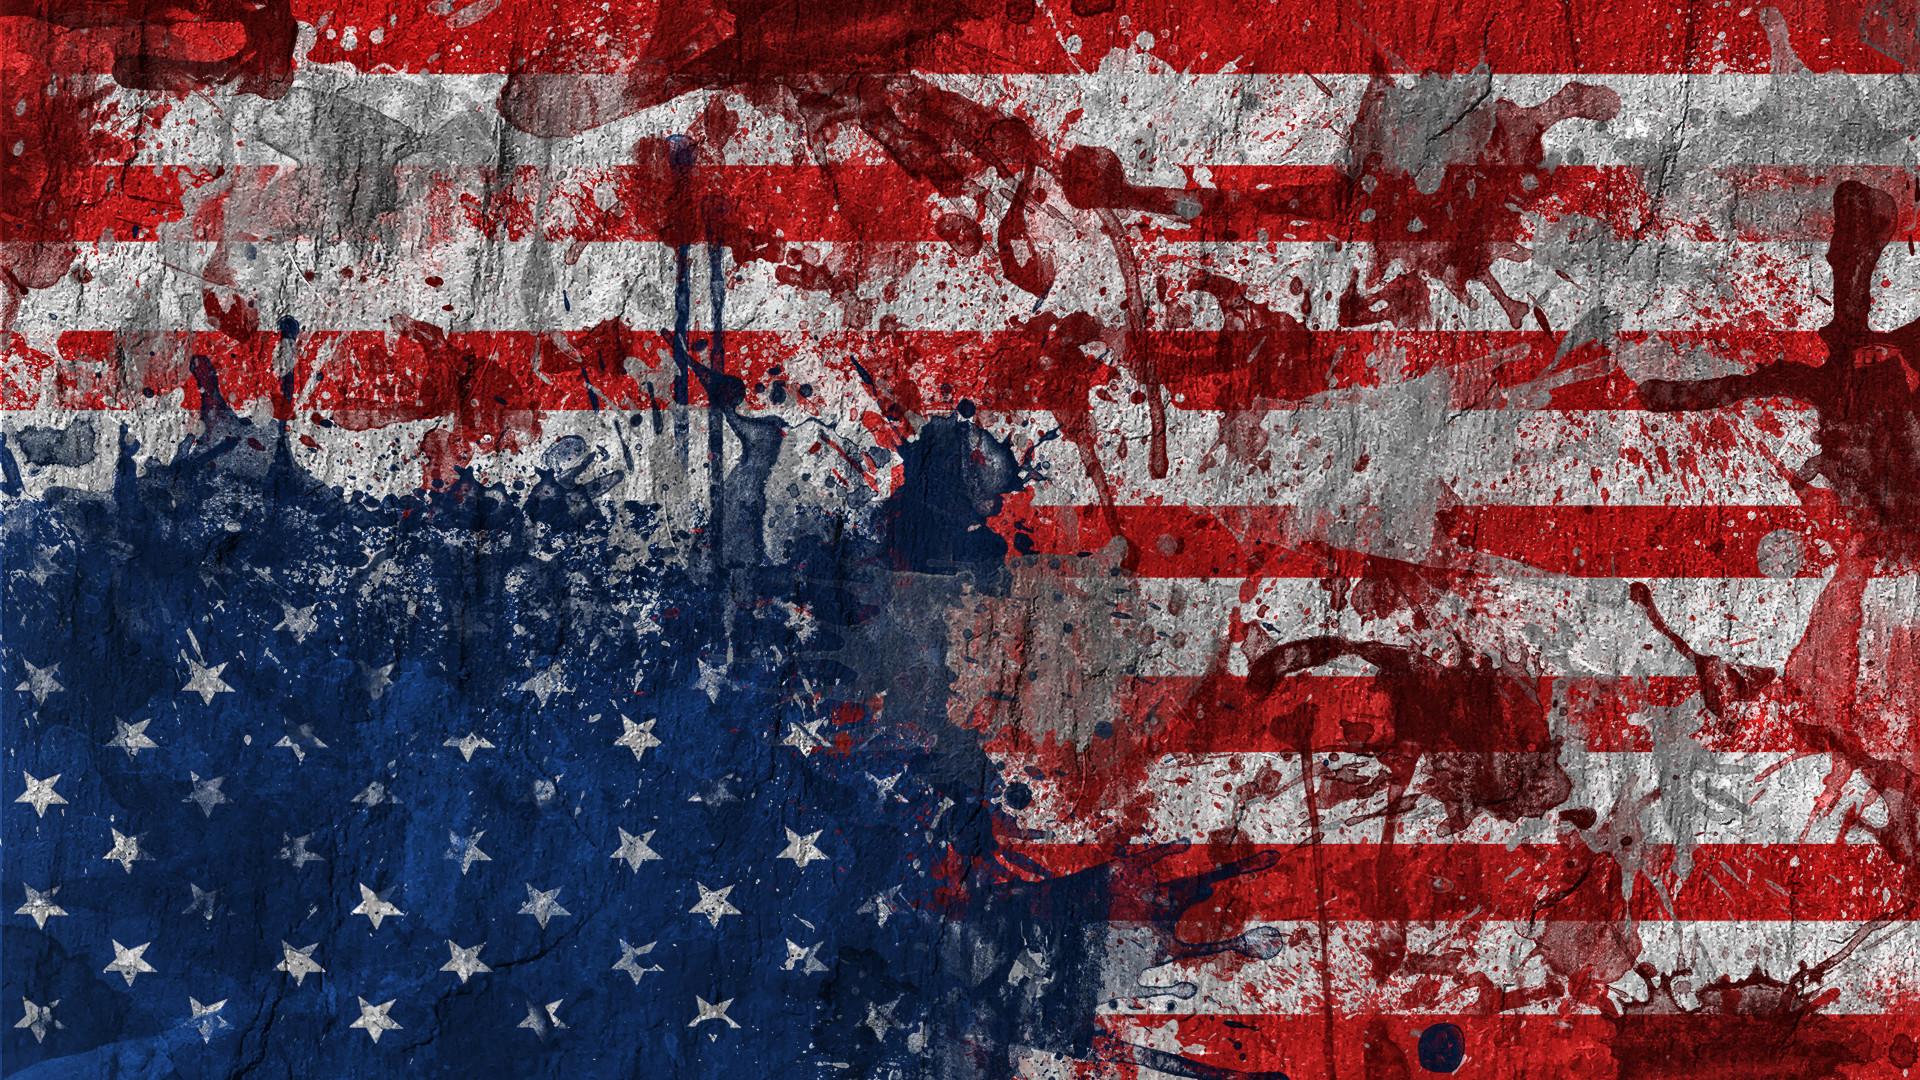 Man Made – American Flag Wallpaper